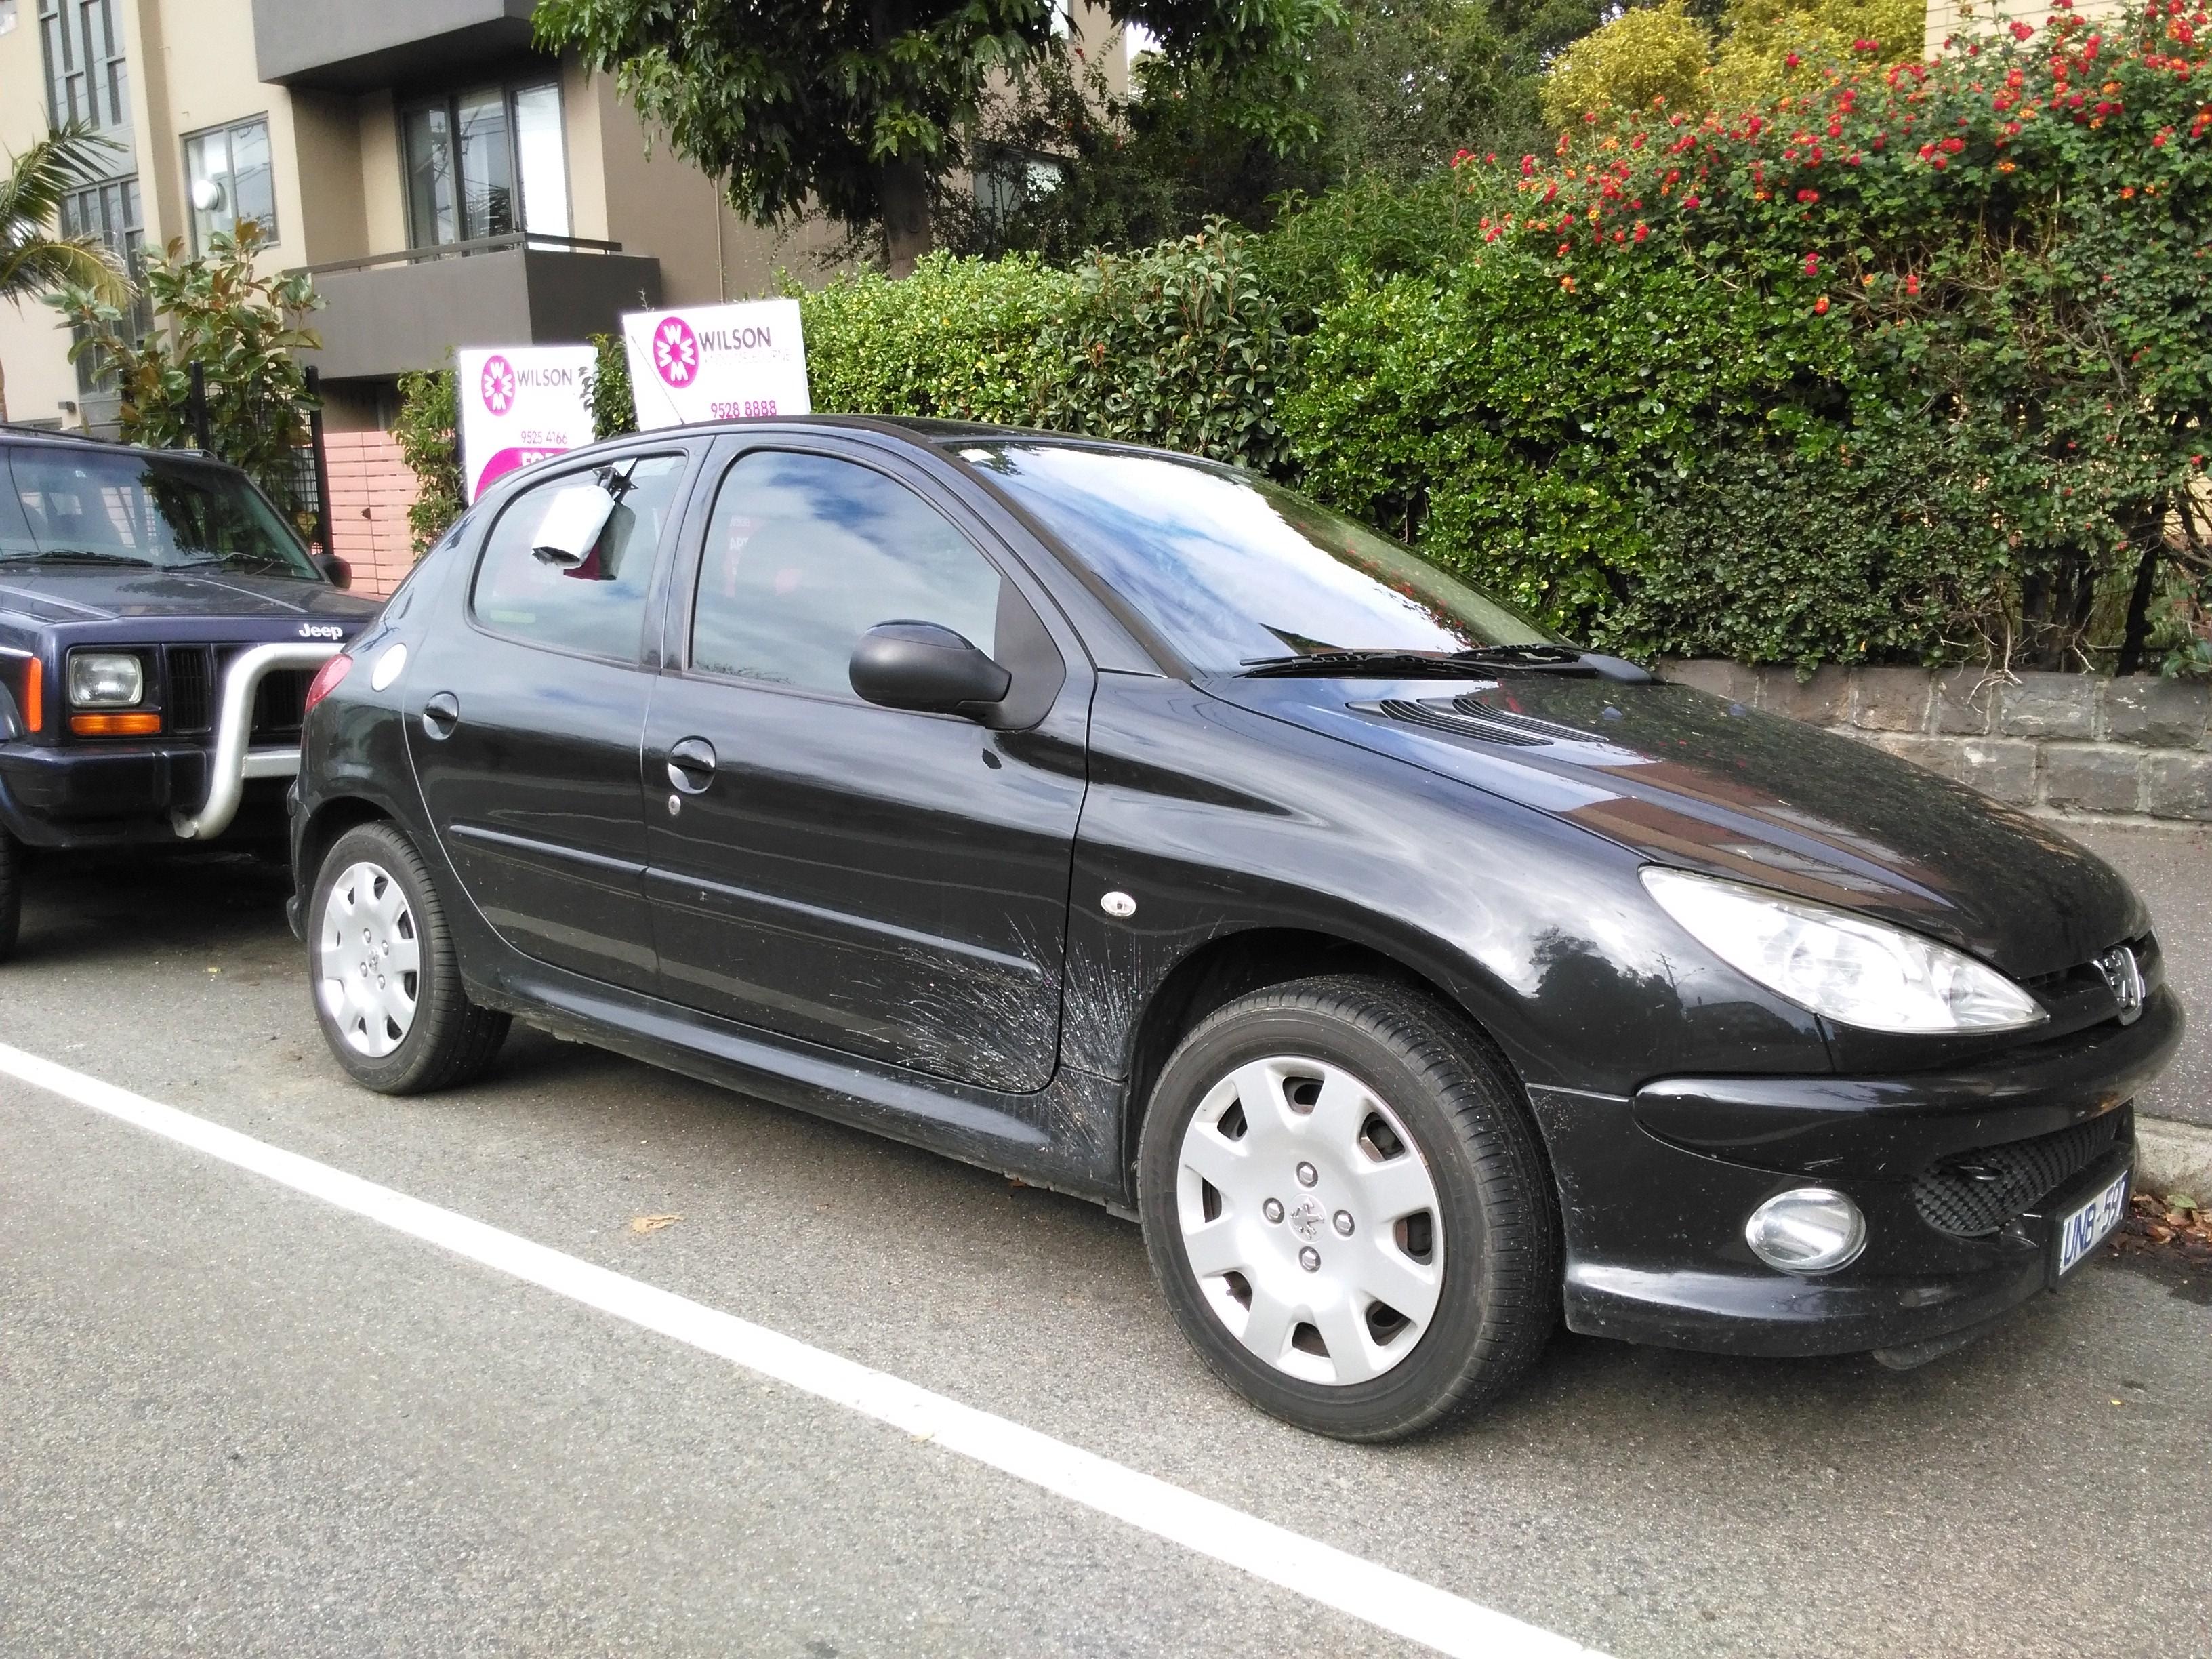 Picture of Vanessa's 2006 Peugeot 206 Gti